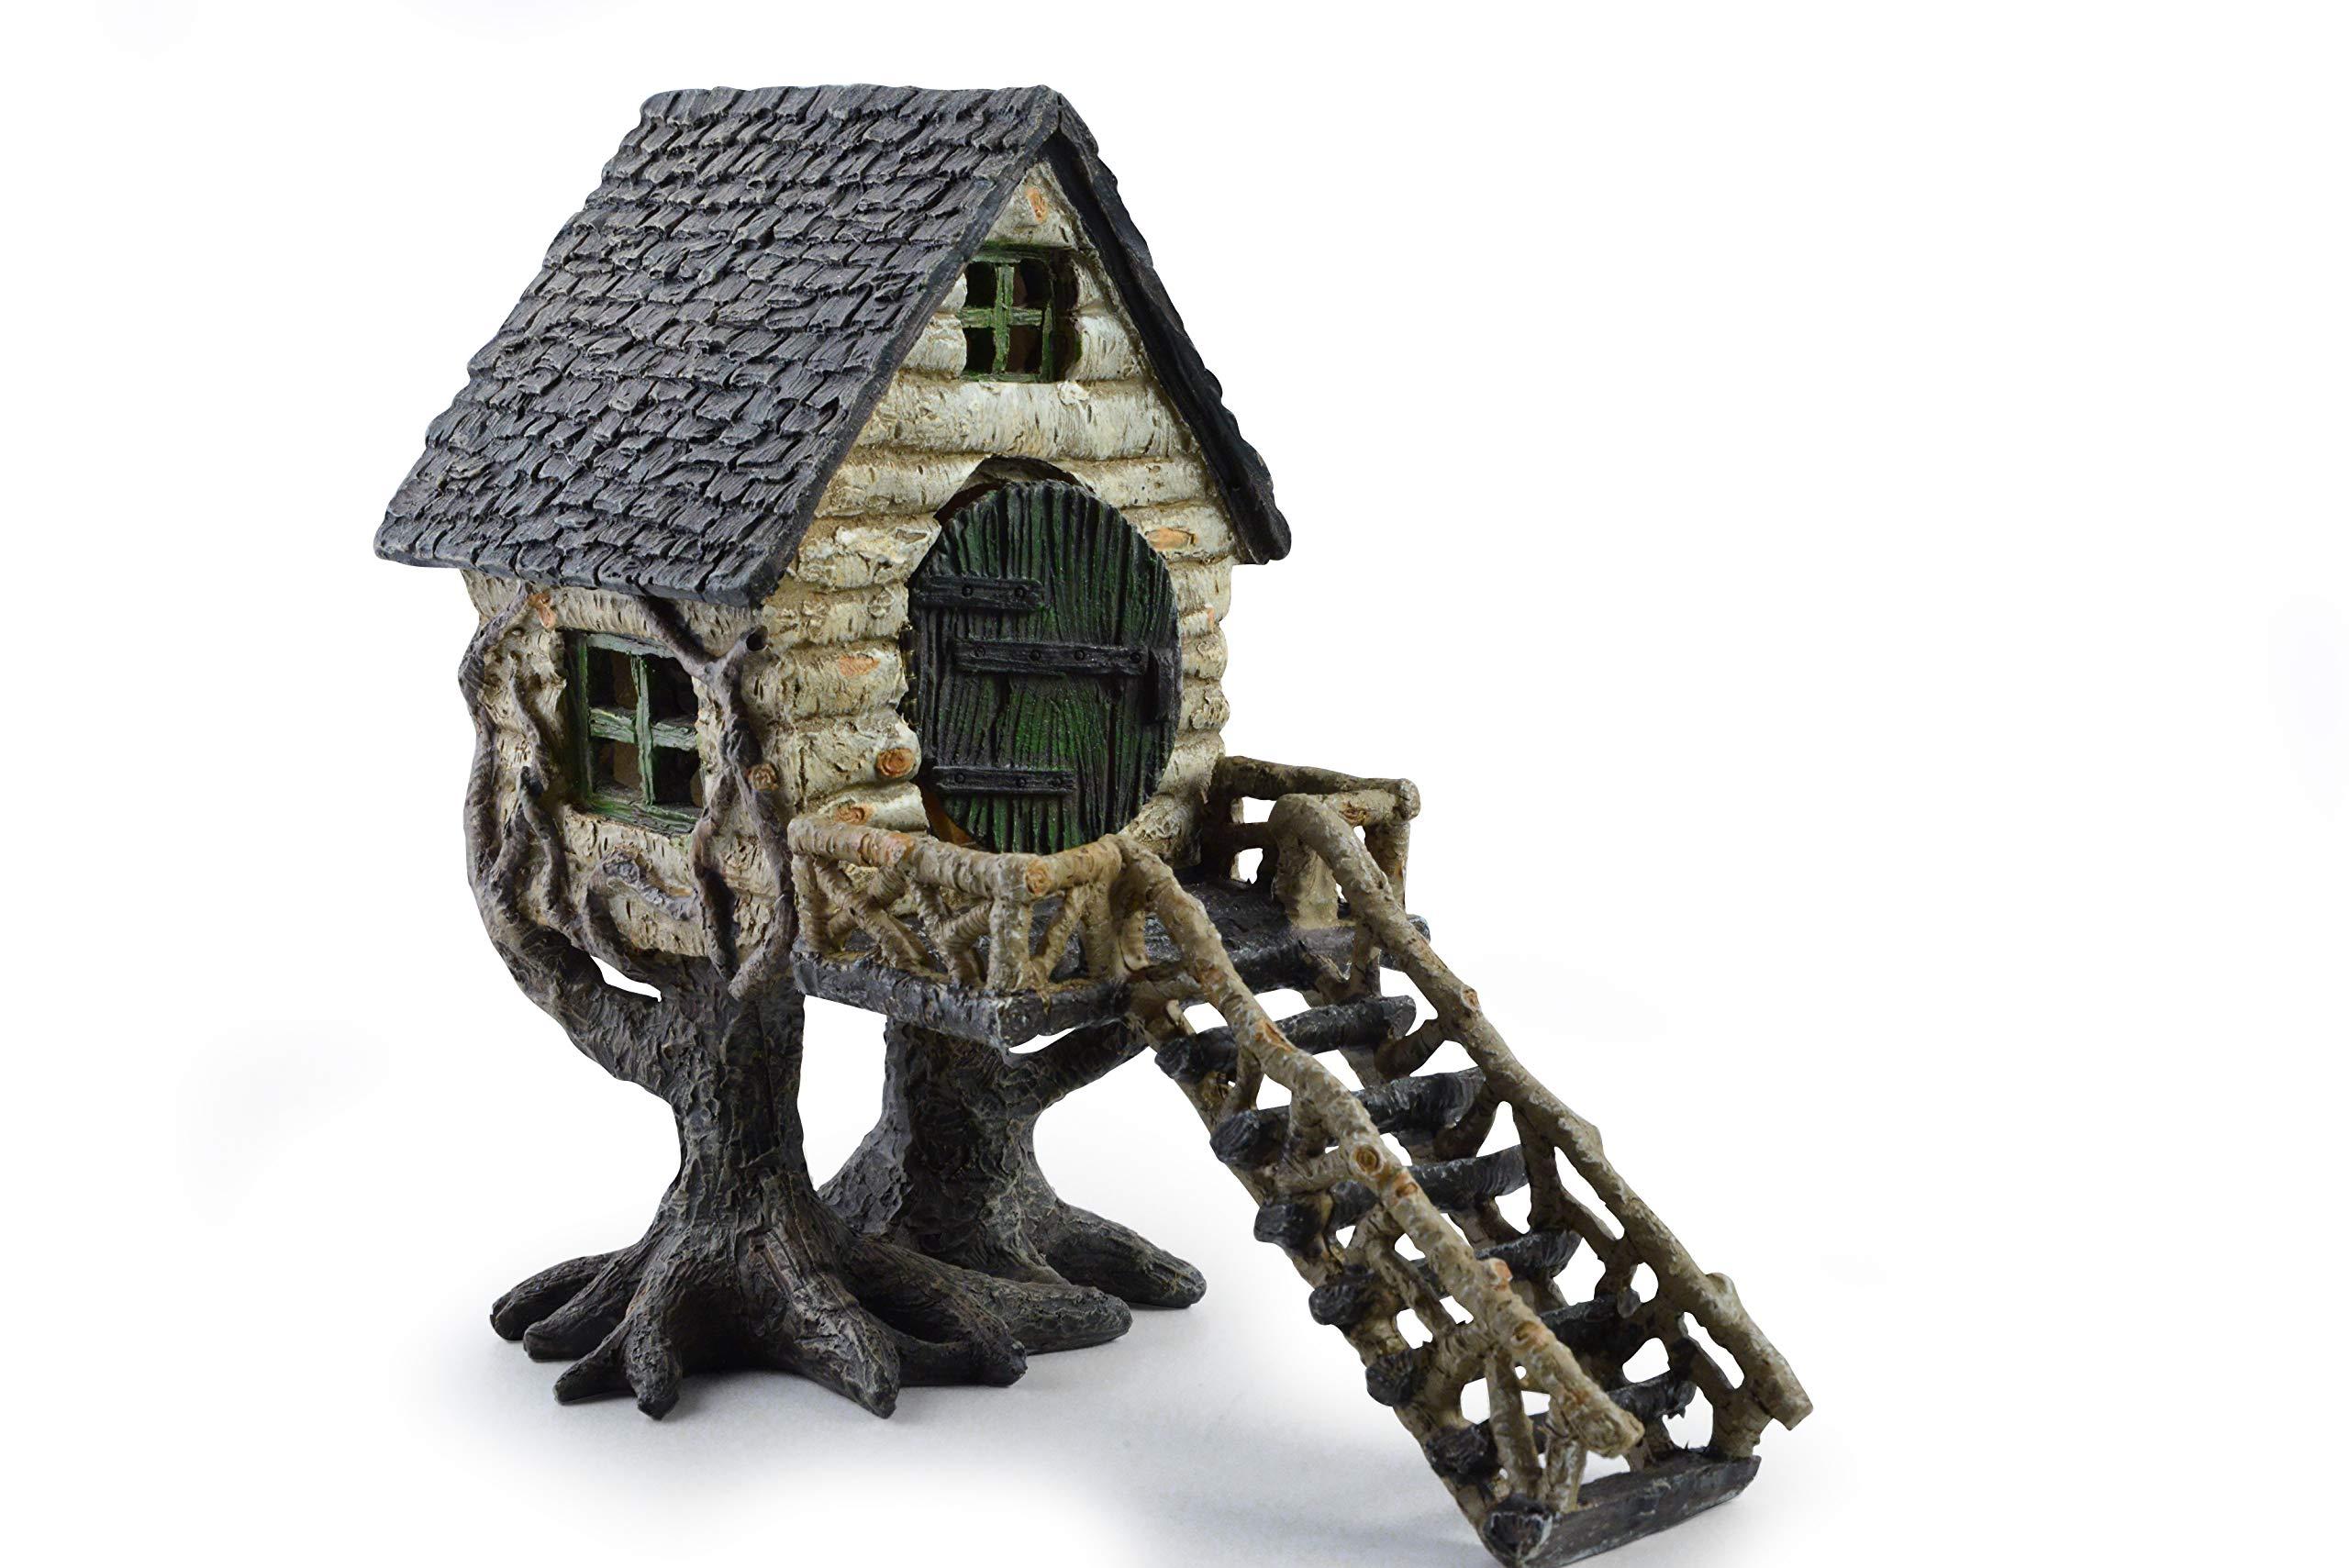 Miniature Fairy House Statue - Garden Décor Accessories Home for Fairies (River Birch Tree House)